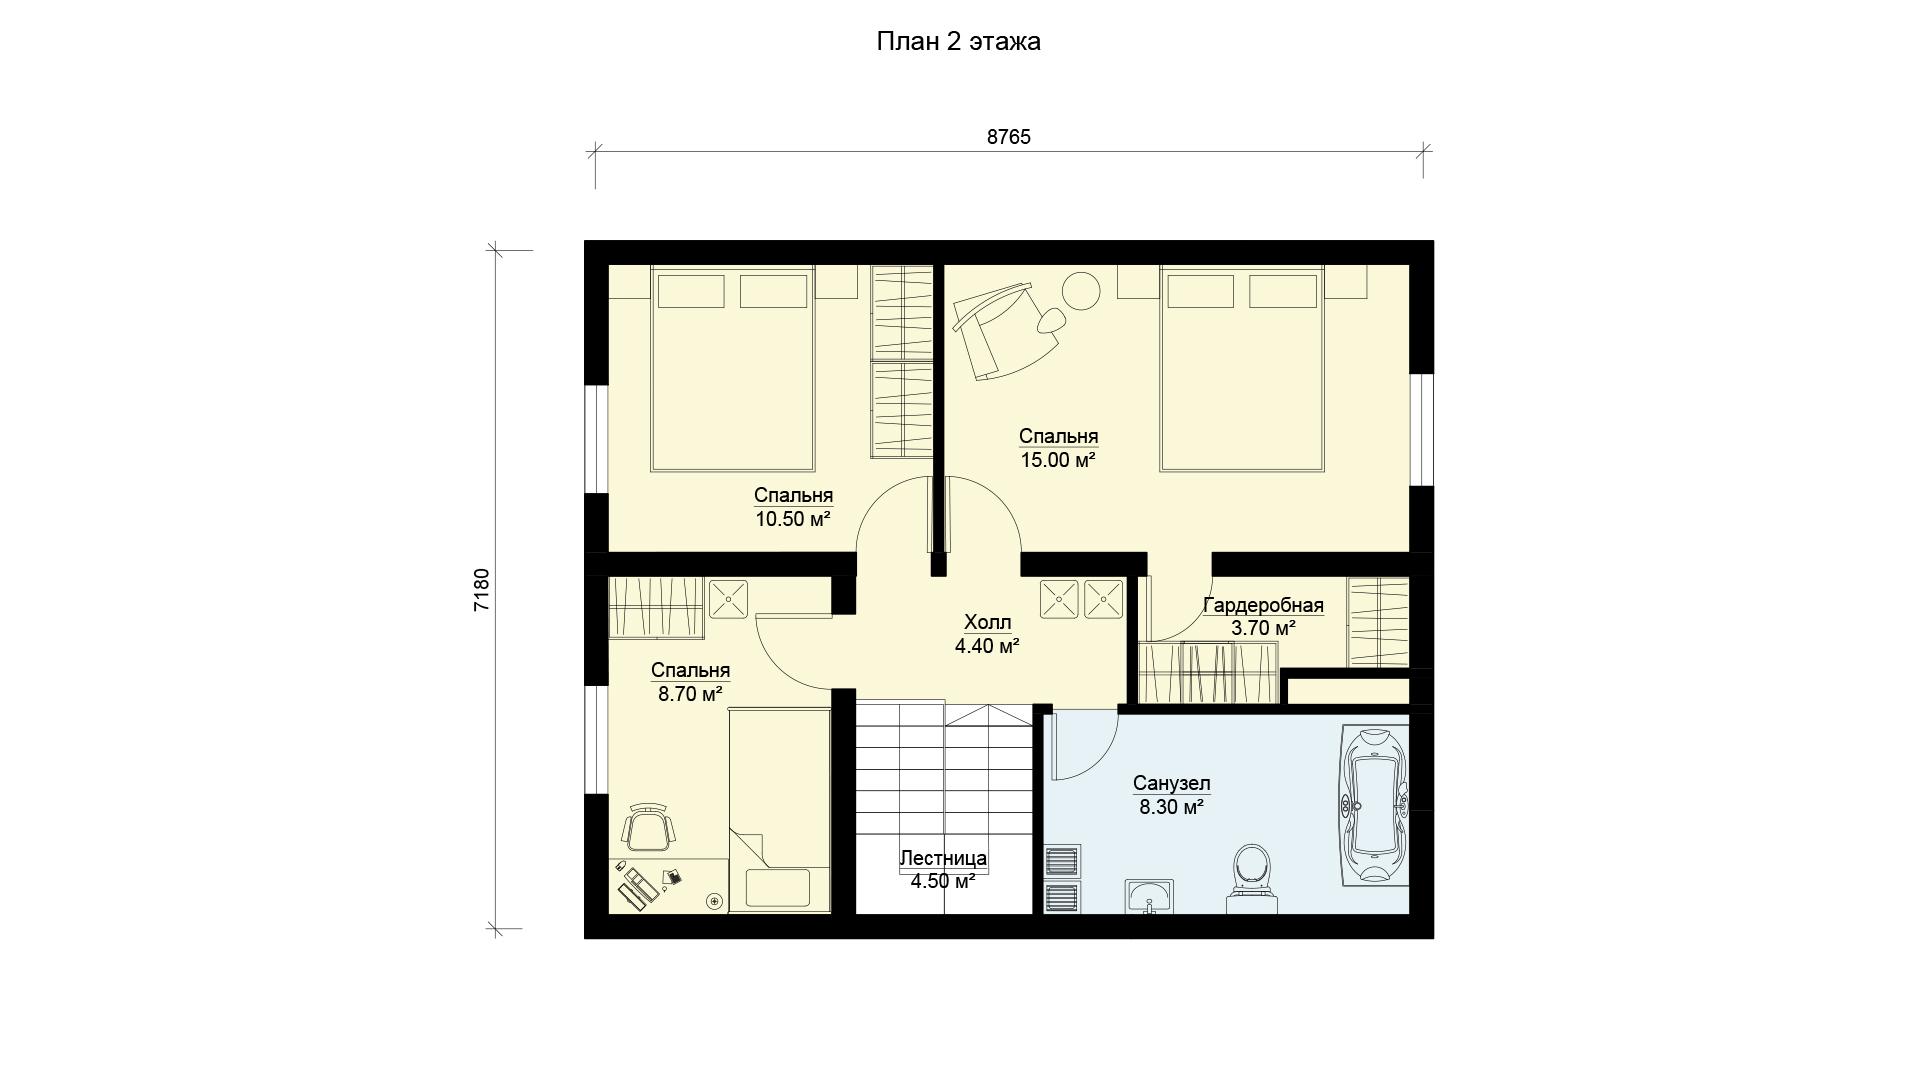 План мансардного этажа двухэтажного дома БЭНПАН, проект МС-117.